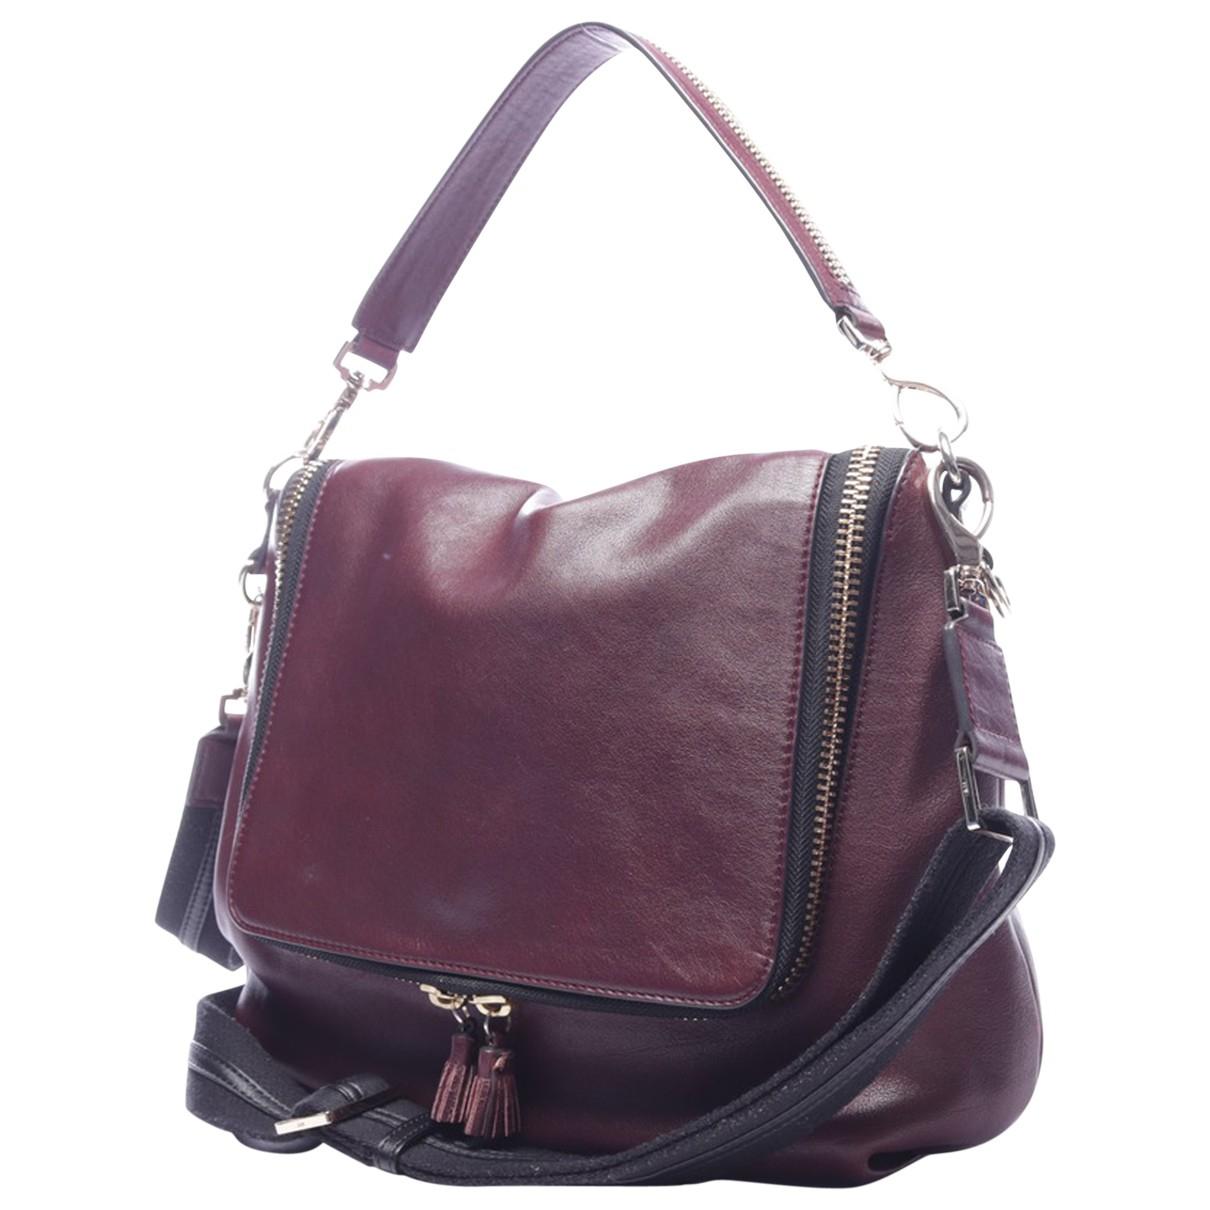 Anya Hindmarch \N Purple Leather handbag for Women \N